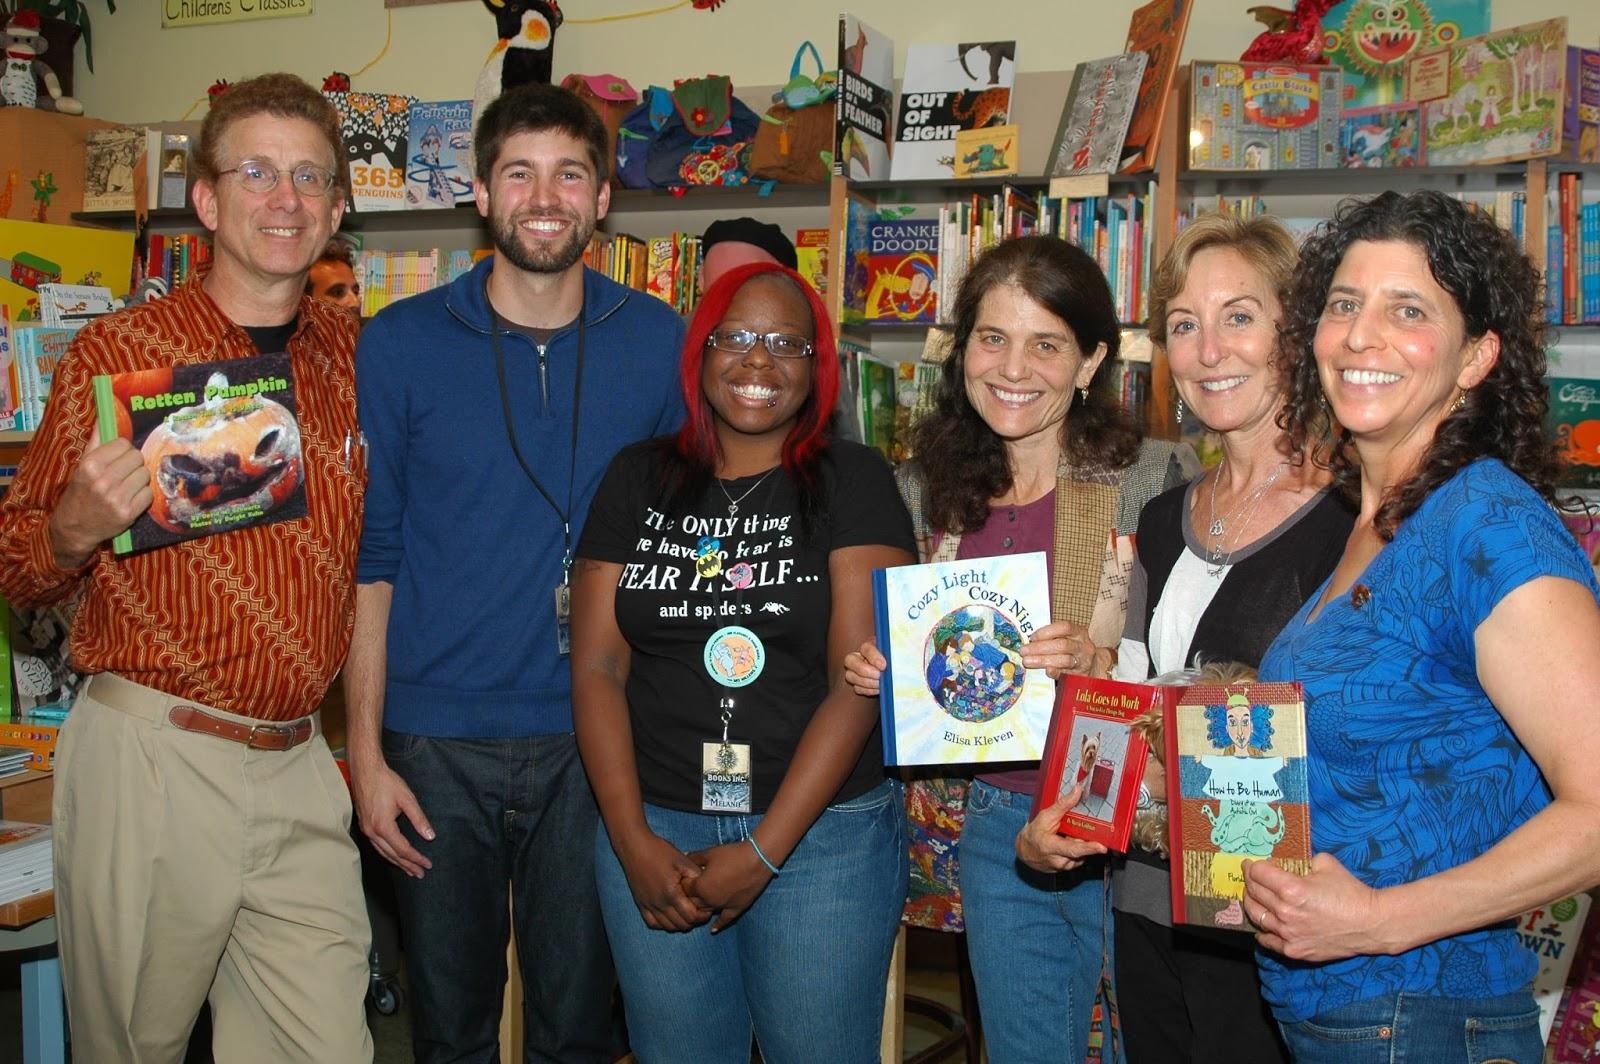 Bay Area Author Kickstarts New Children's Publishing Venture